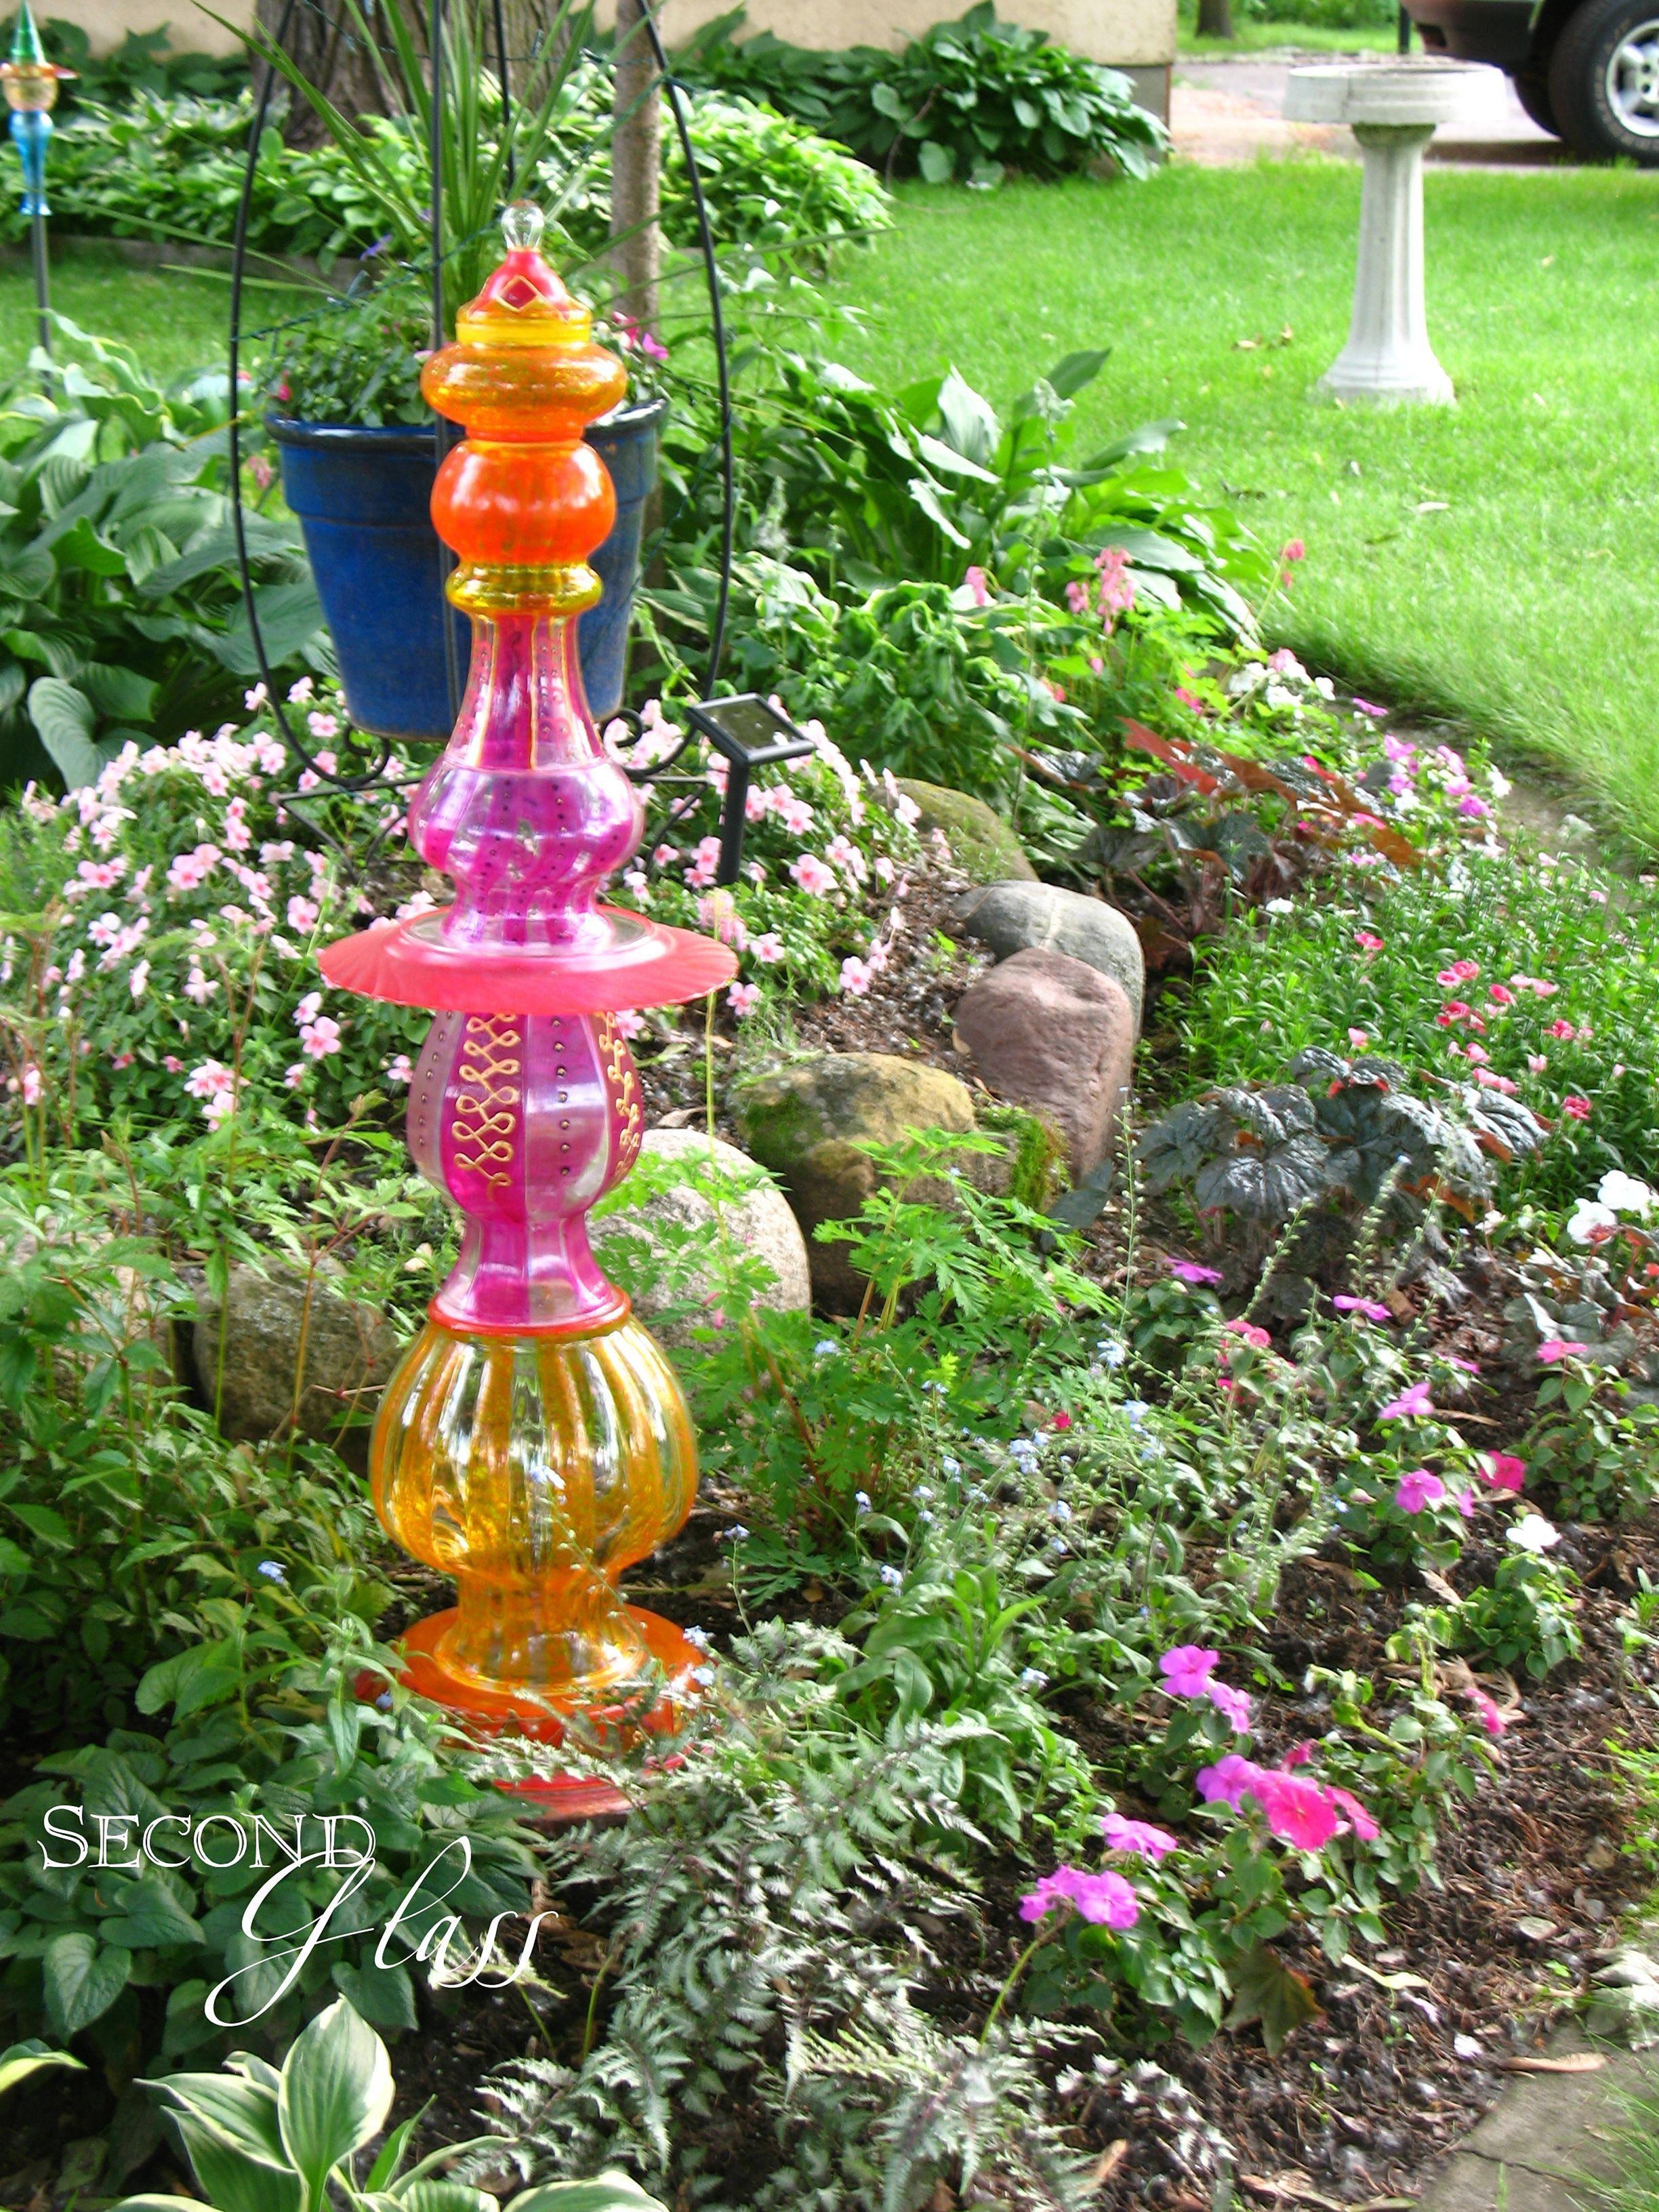 Ordinaire ... Glass Yard Art Design Ideas For Your Garden Decor  Https://decorathing.com/garden Ideas/easy 25 Diy Glass Yard  Art Design Ideas For Your Garden Decor/